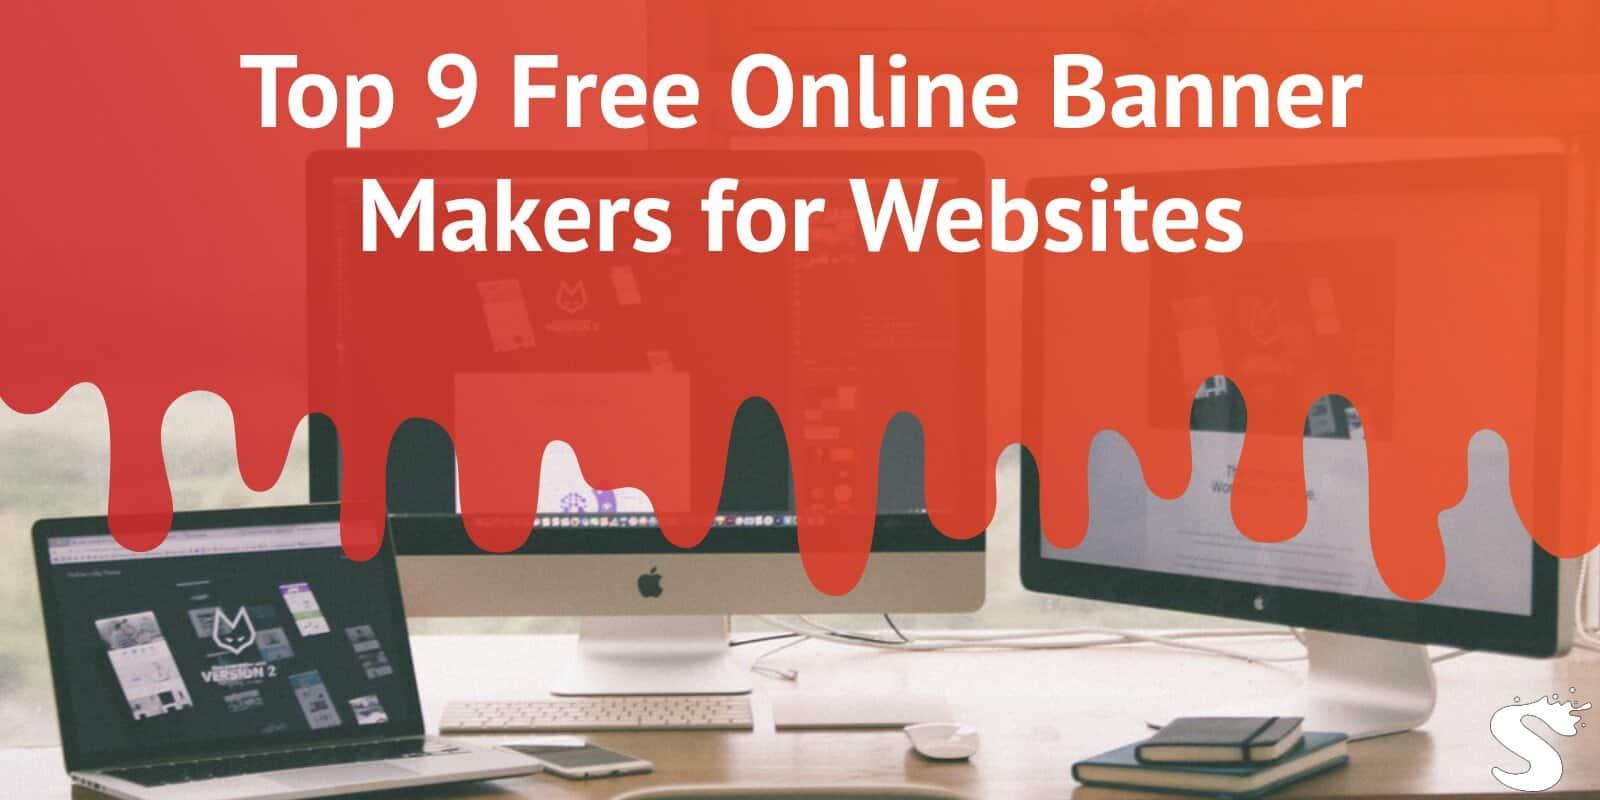 Top 9 free online banner makers for websites